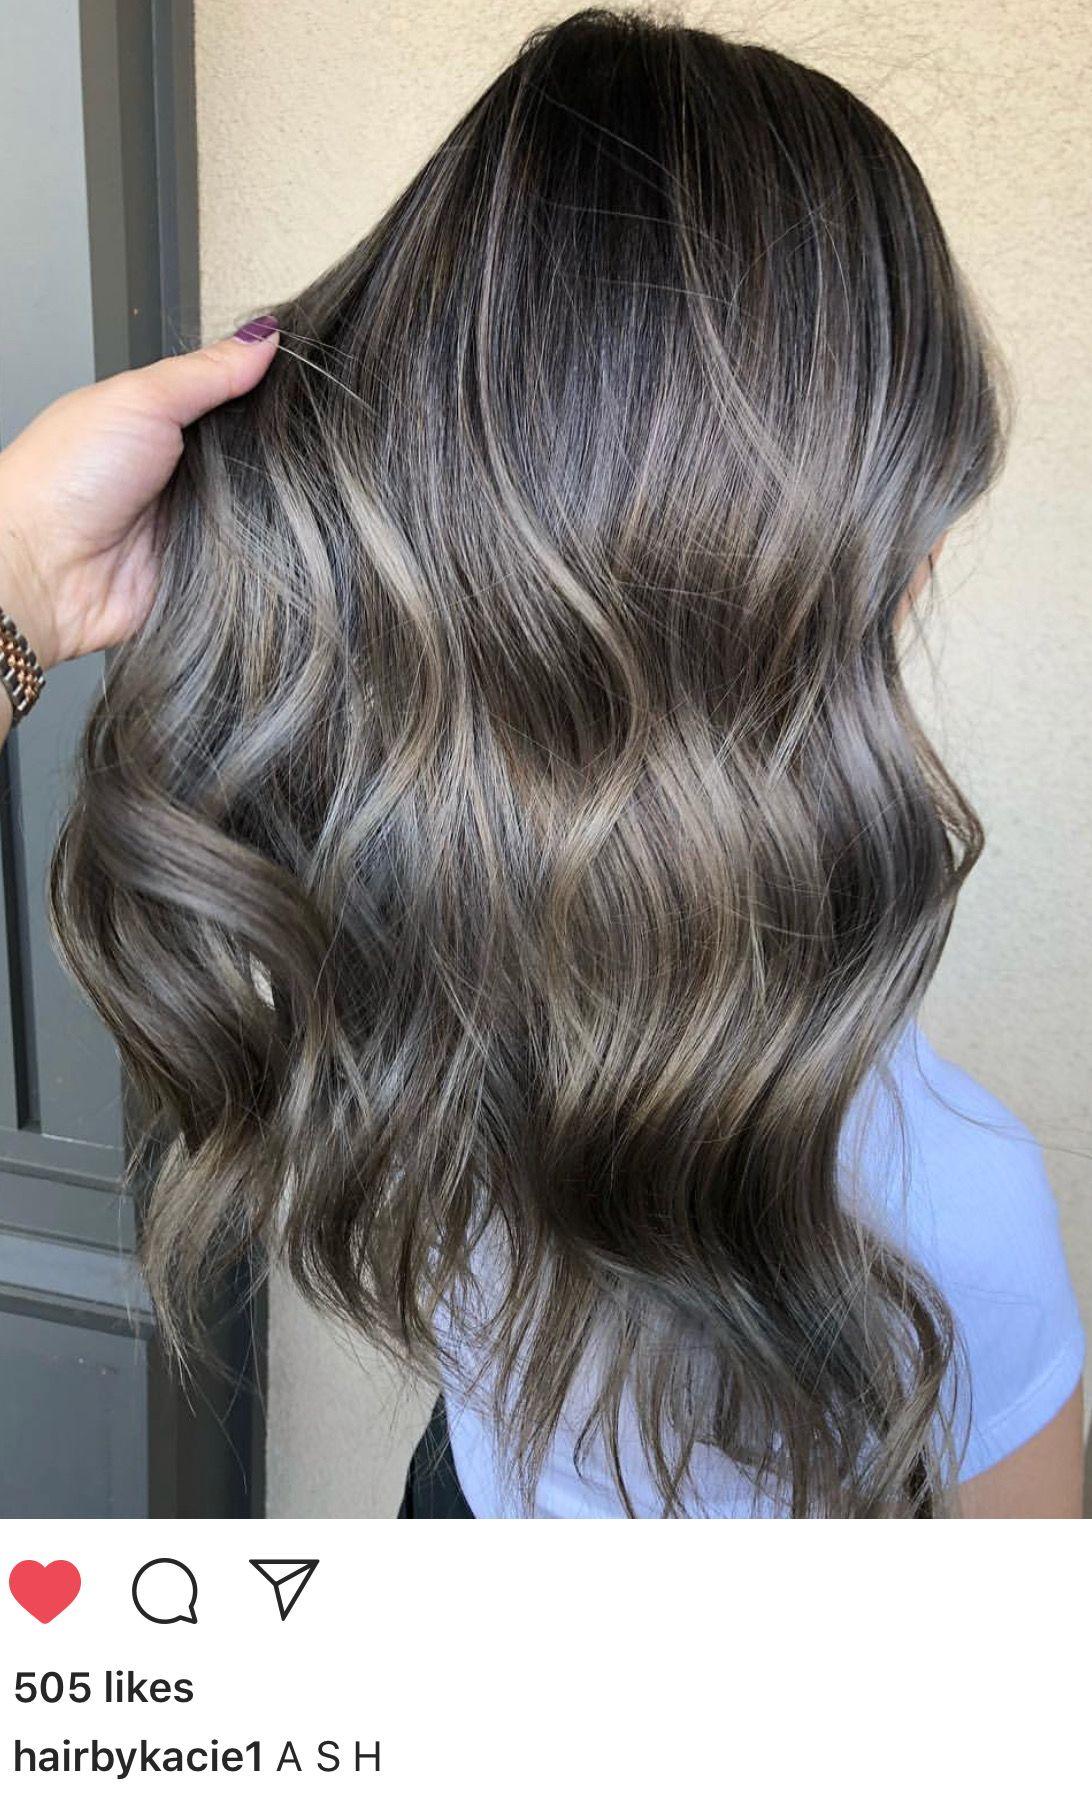 Pinterest Chandlerjocleve Instagram Chandlercleveland Brunette Balayage Hair Brown Hair Balayage Hair Highlights